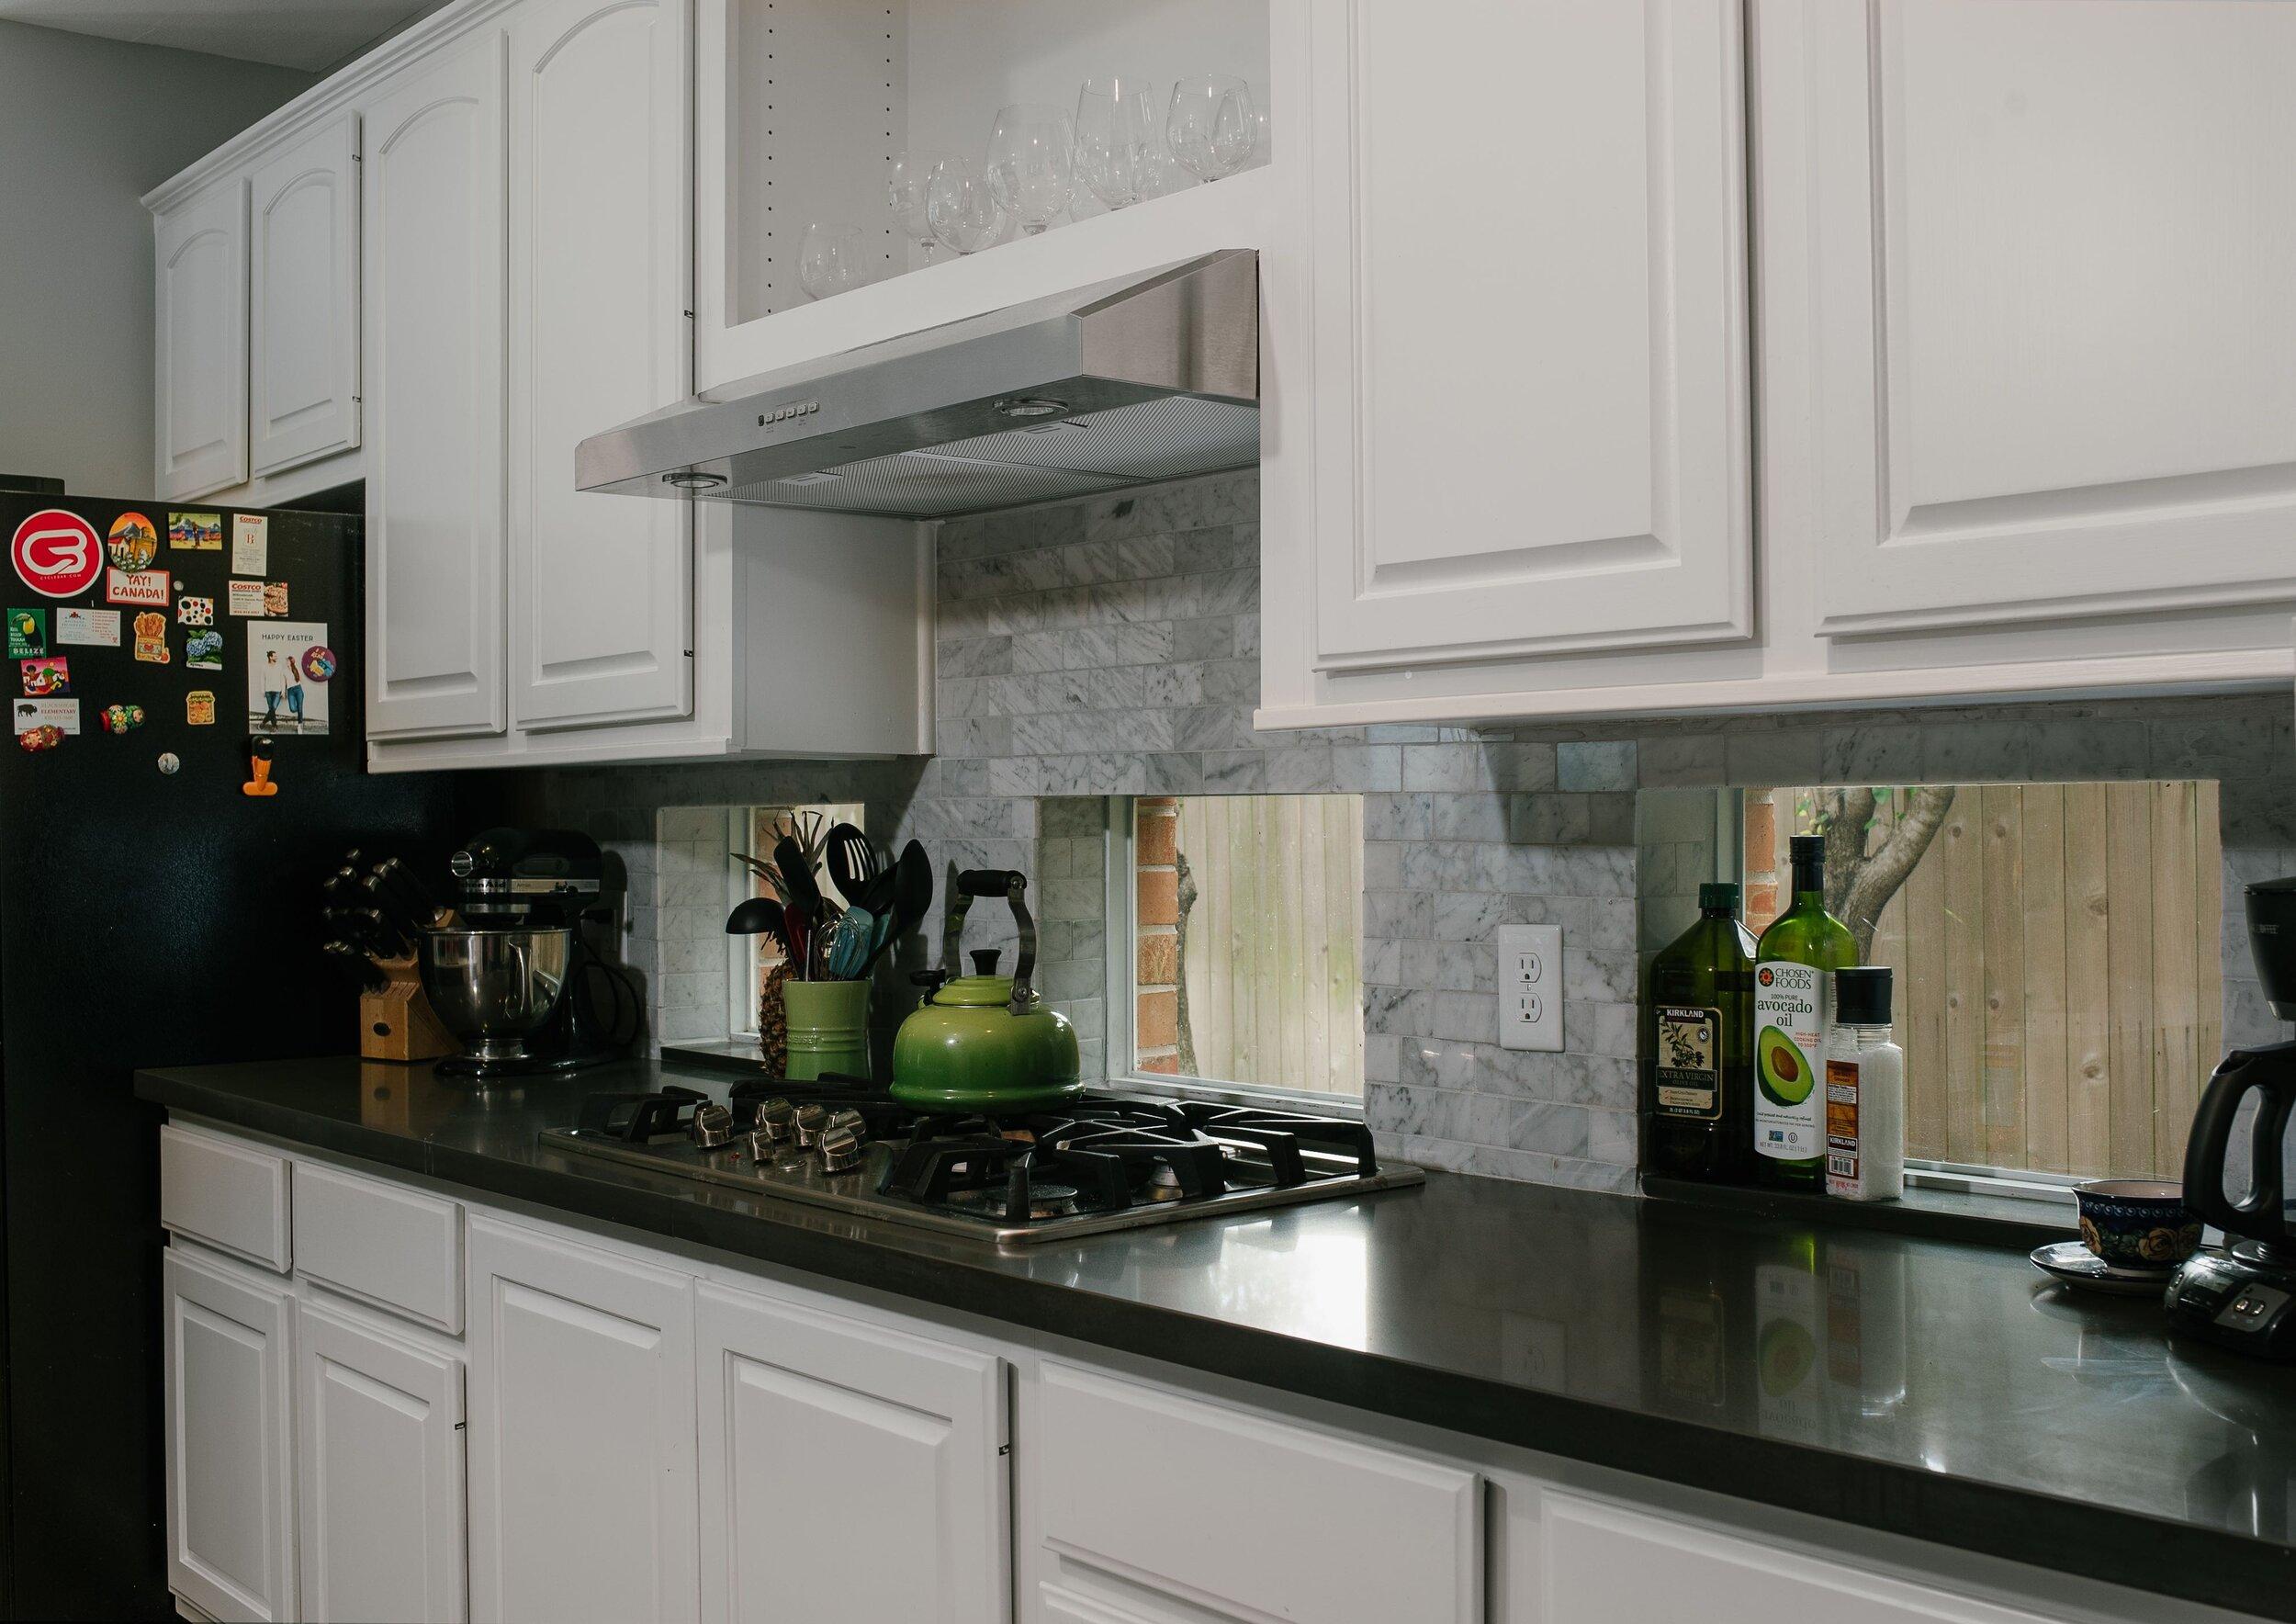 Grey backsplash tile, kitchen windows, black quartz countertops, stovetop, white cabinets. Stunning kitchen remodel.